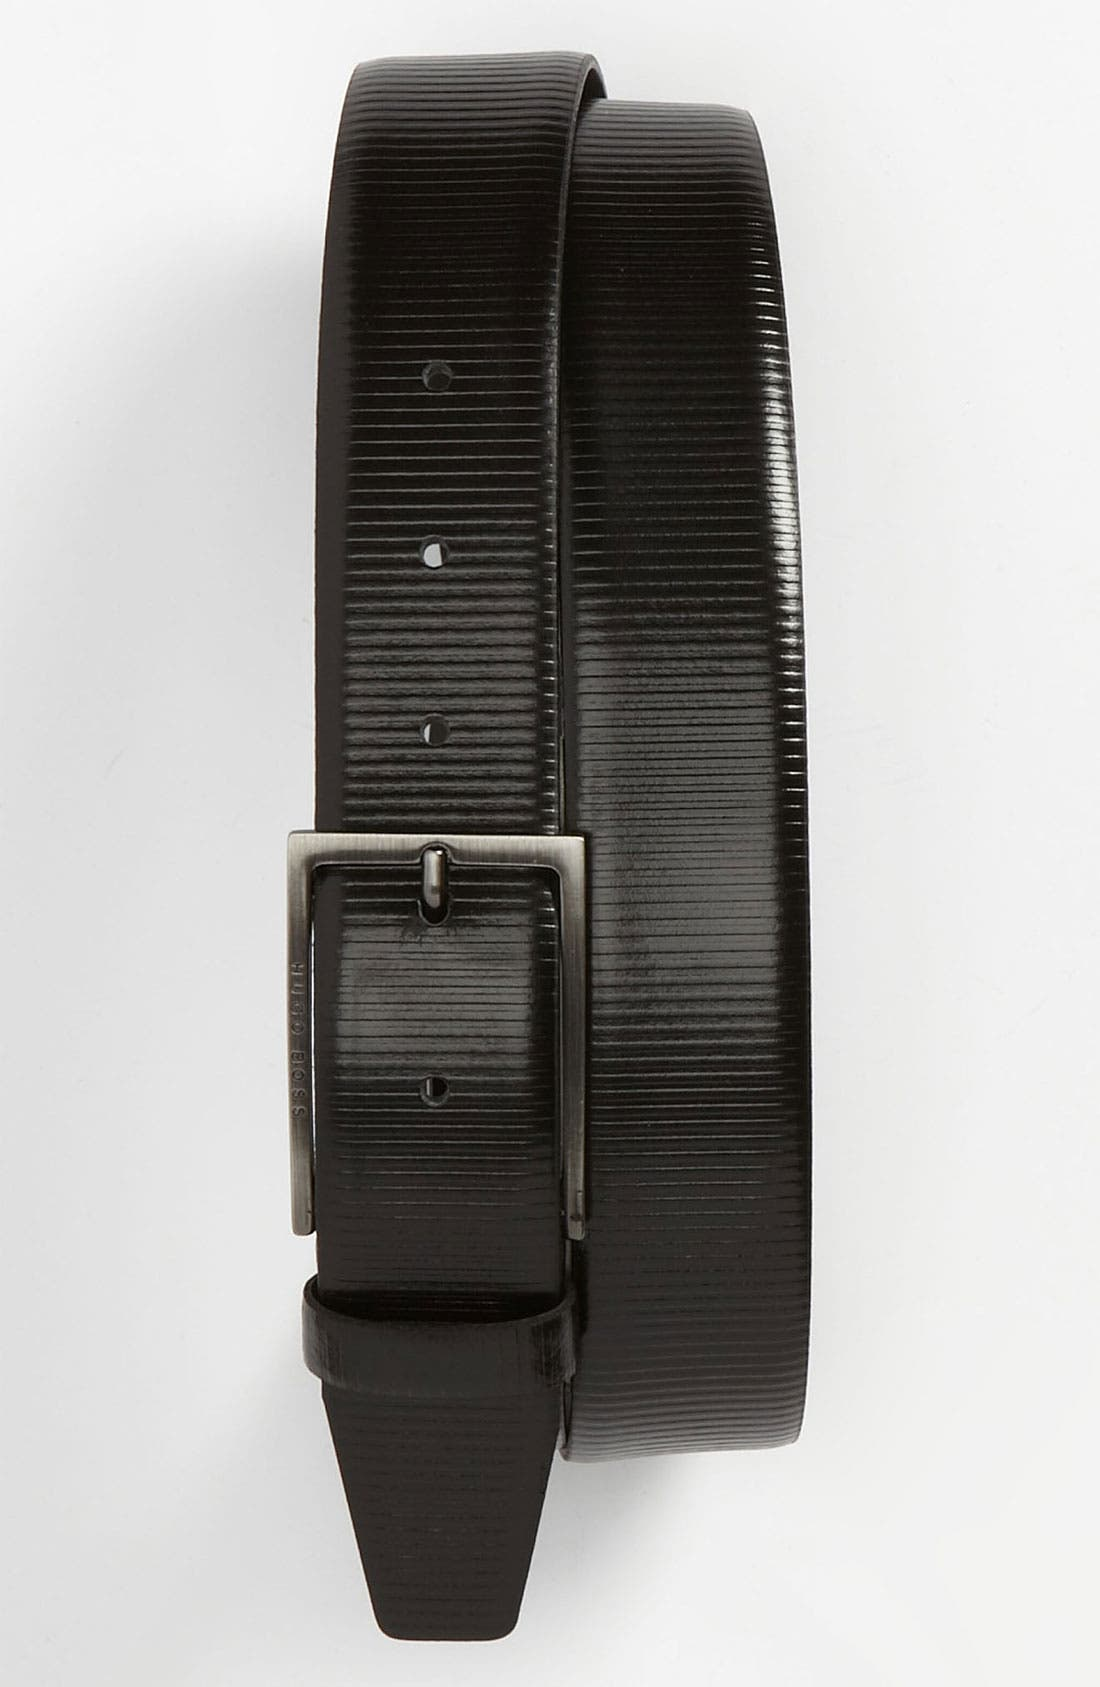 Main Image - BOSS HUGO BOSS 'Caberto' Belt